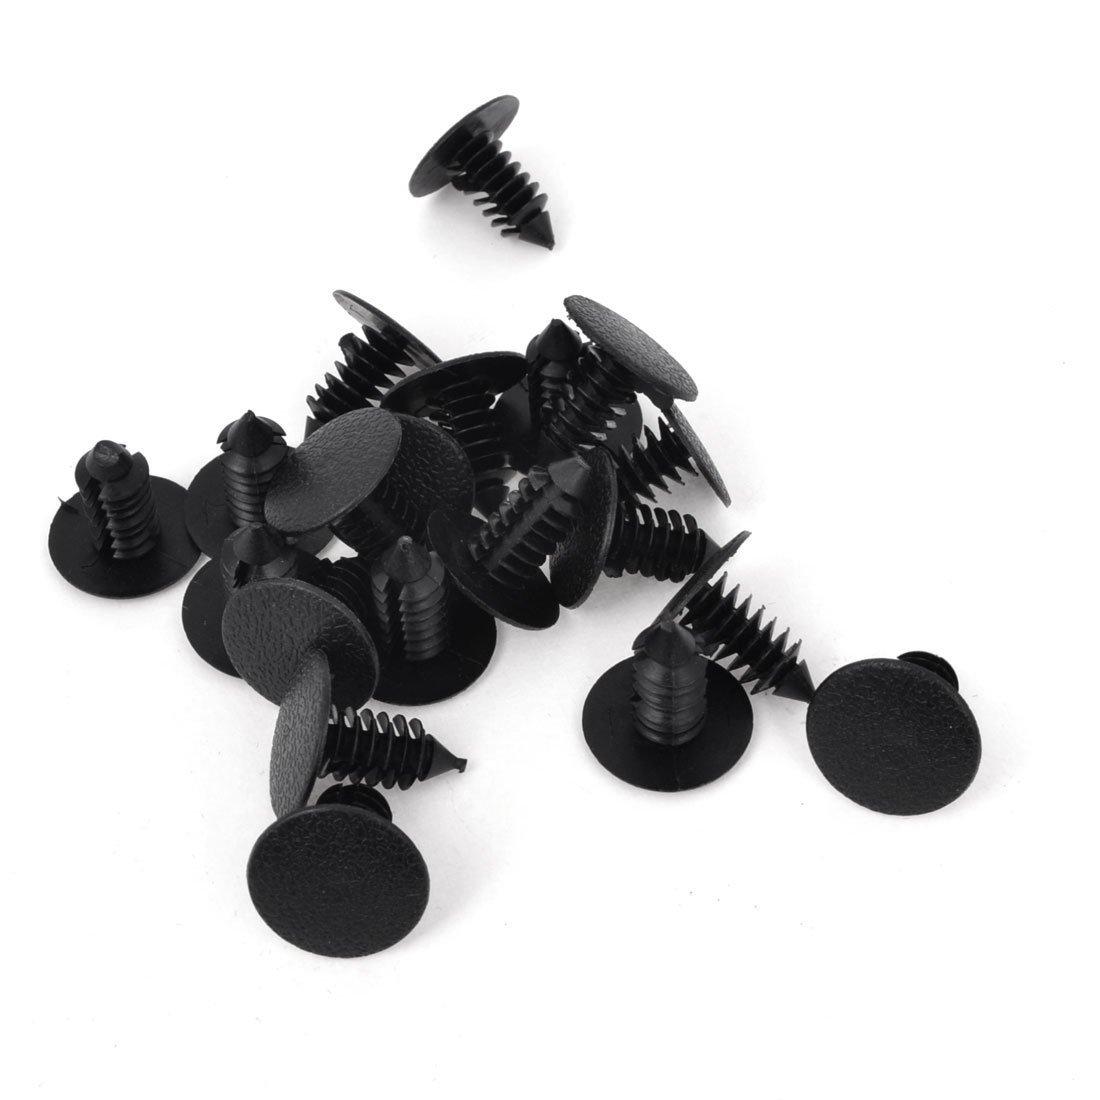 plastico remache Coche 8mm Agujero Plastico Negro Remaches Parachoques Sujetador De Puerta Agarres 20 unidades R SODIAL